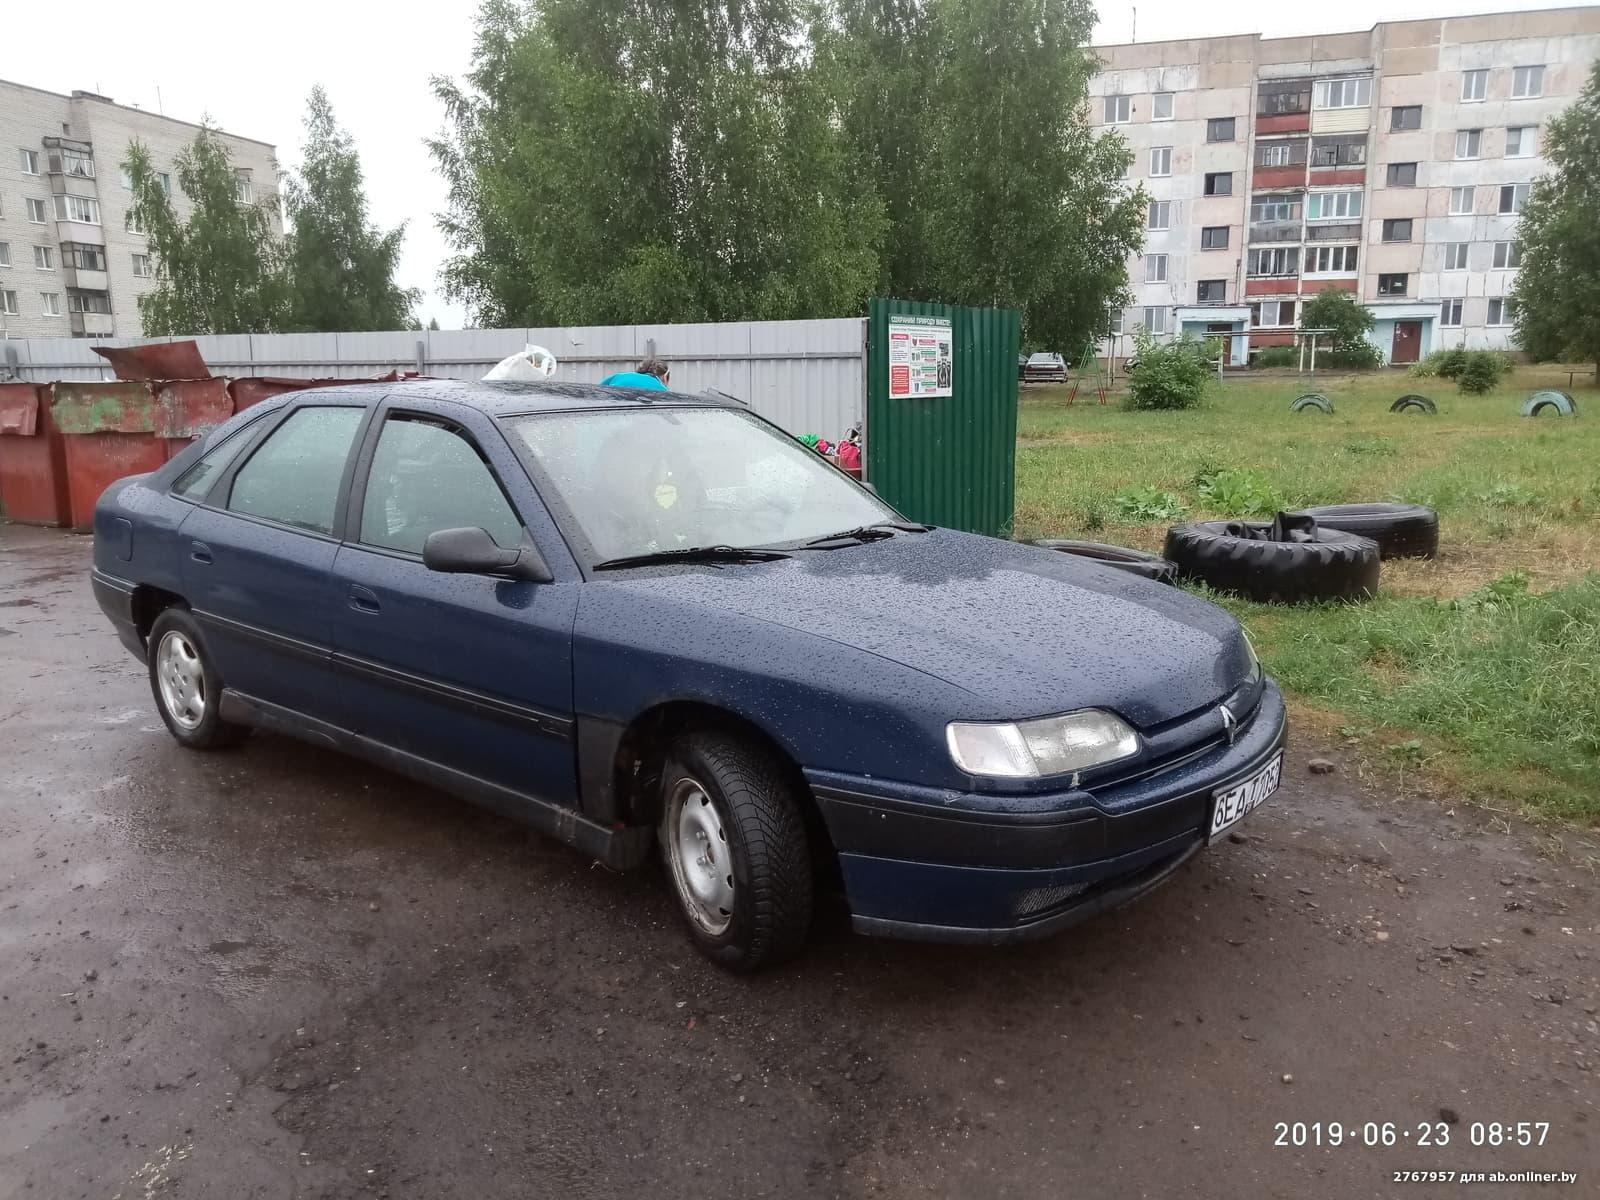 Renault Safrane В54